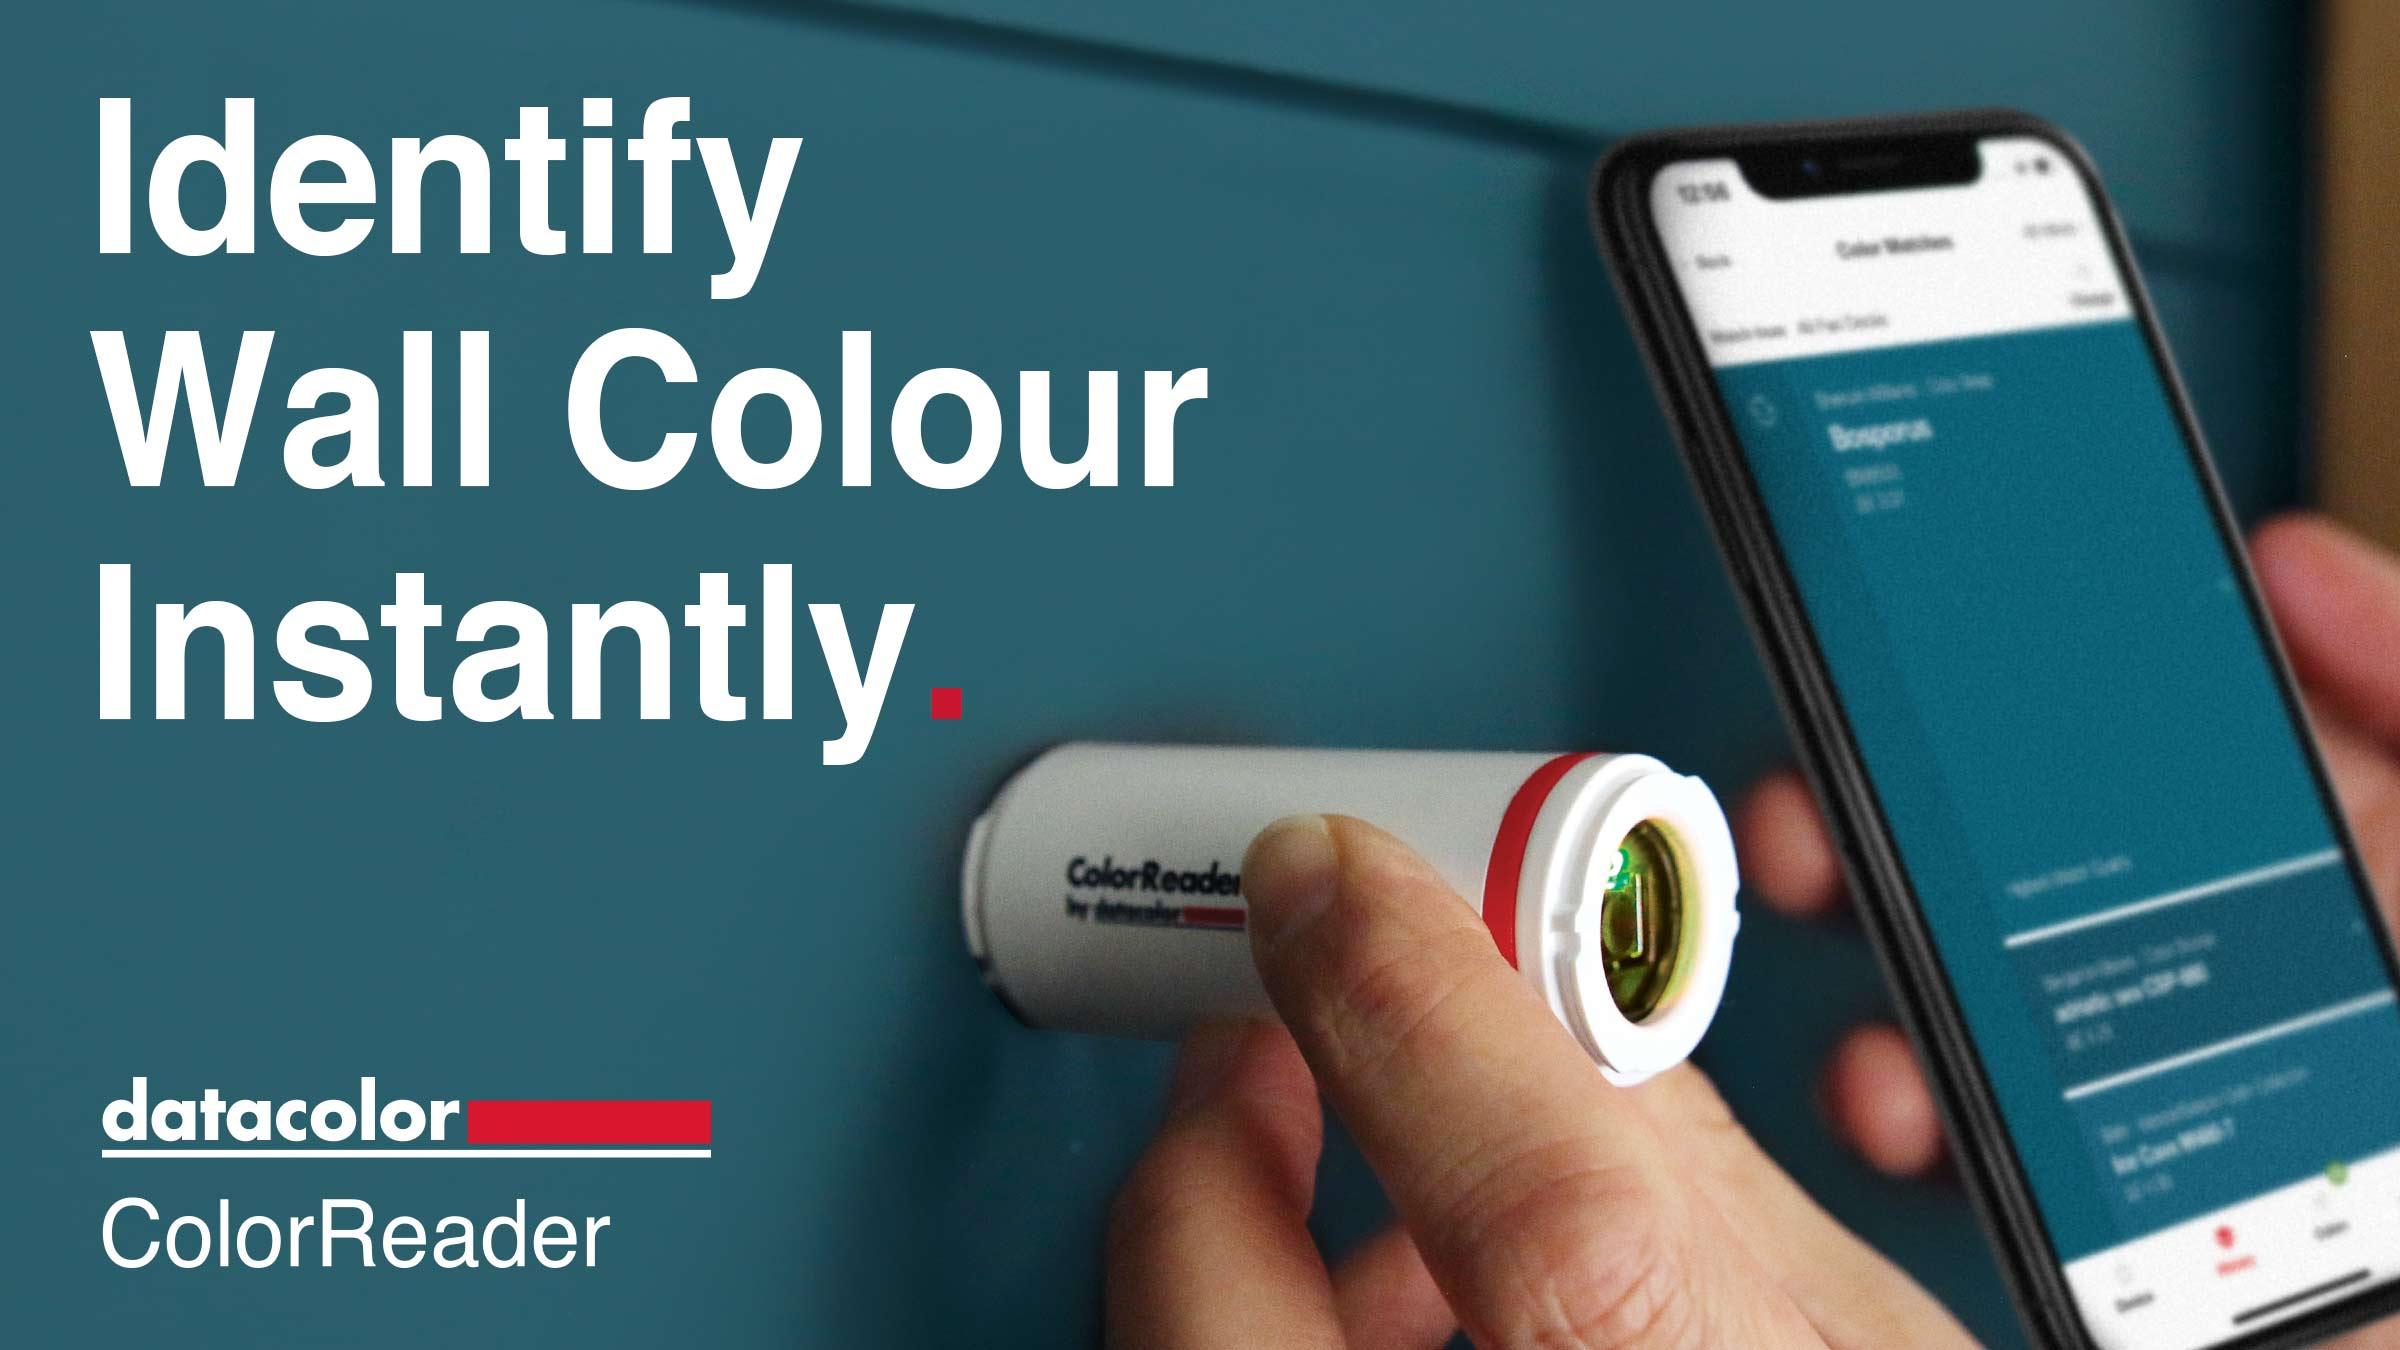 ColorReader gadget